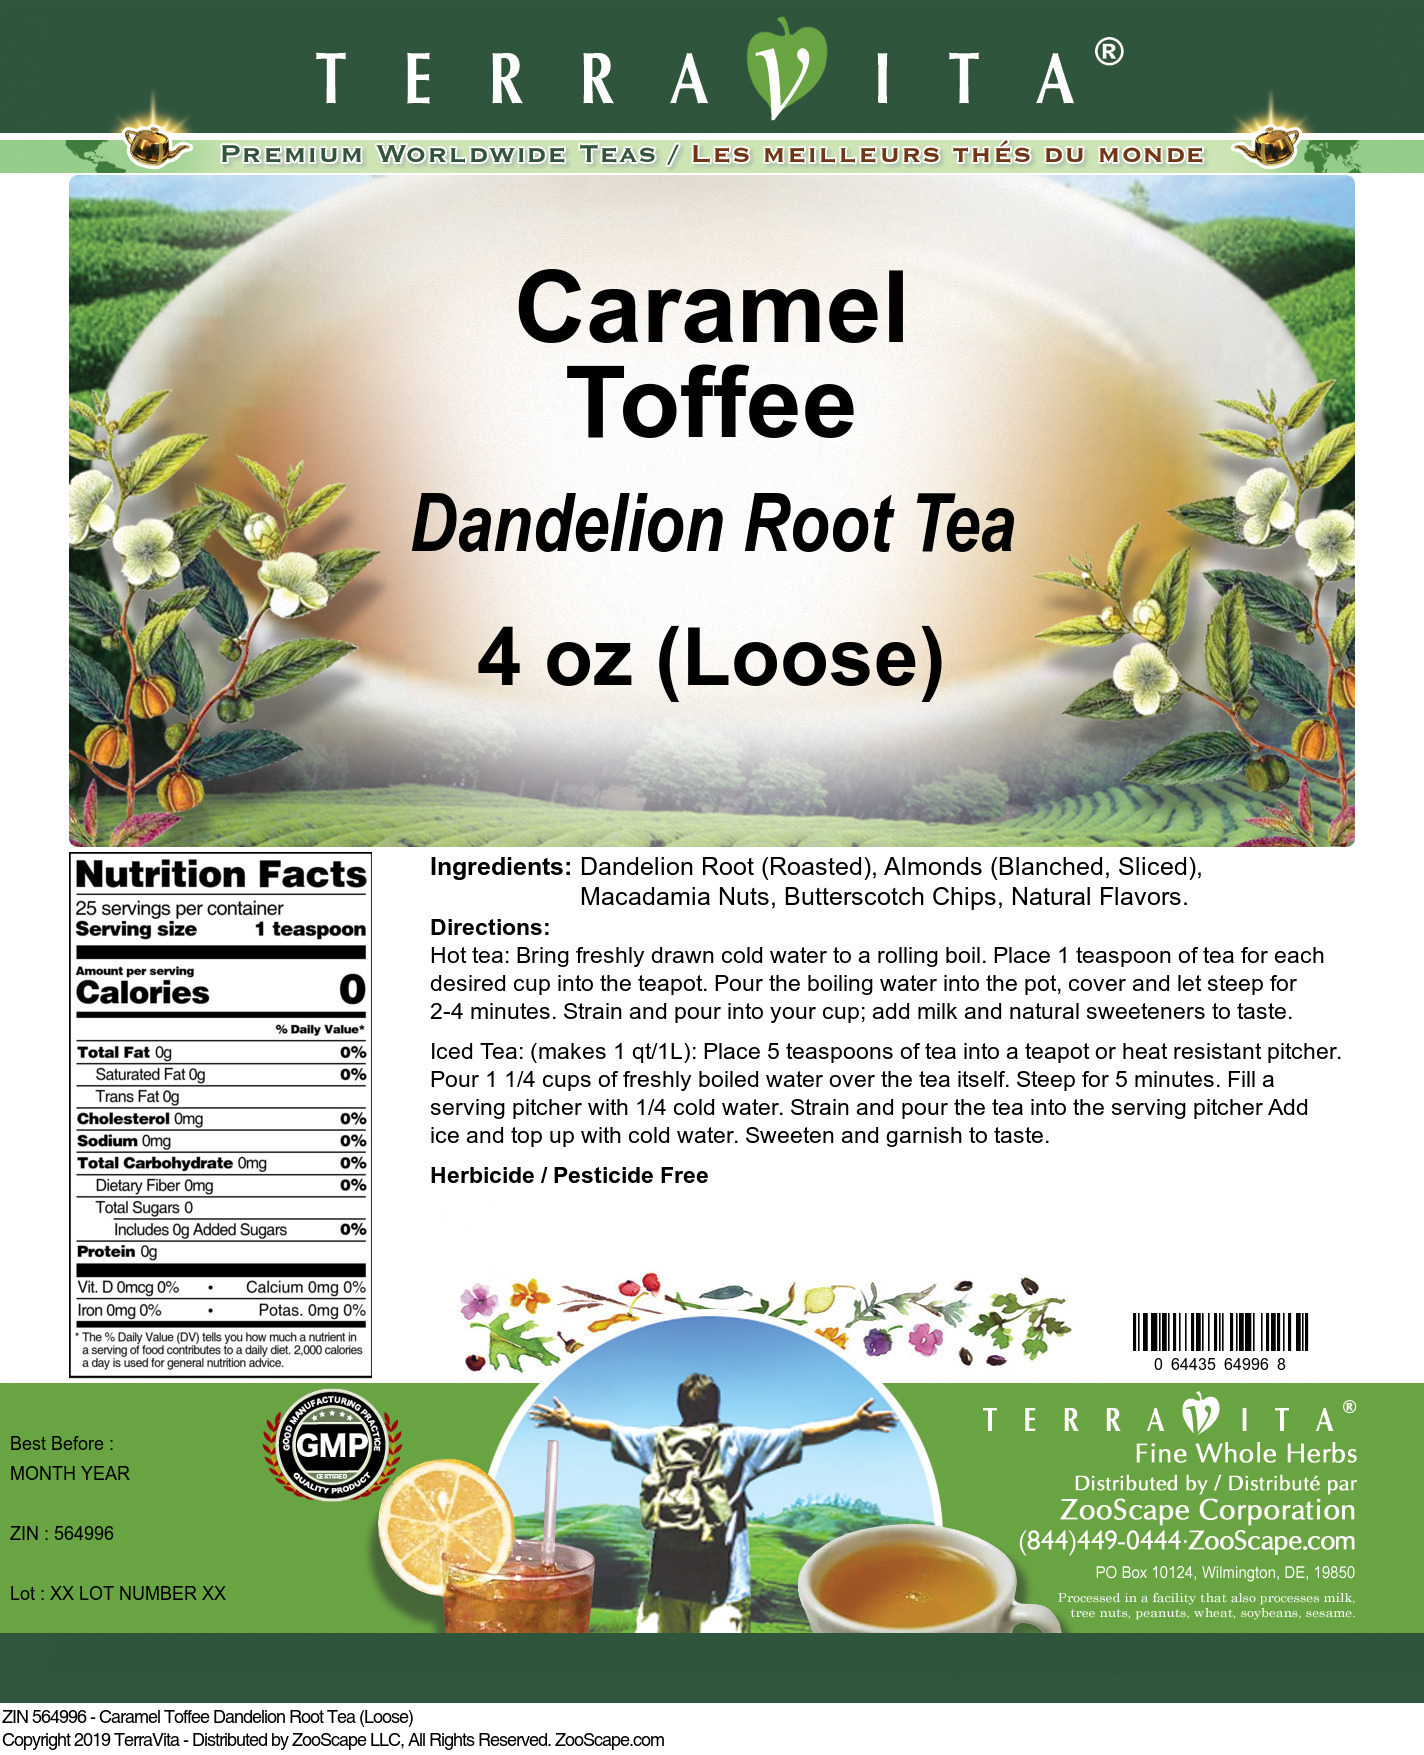 Caramel Toffee Dandelion Root